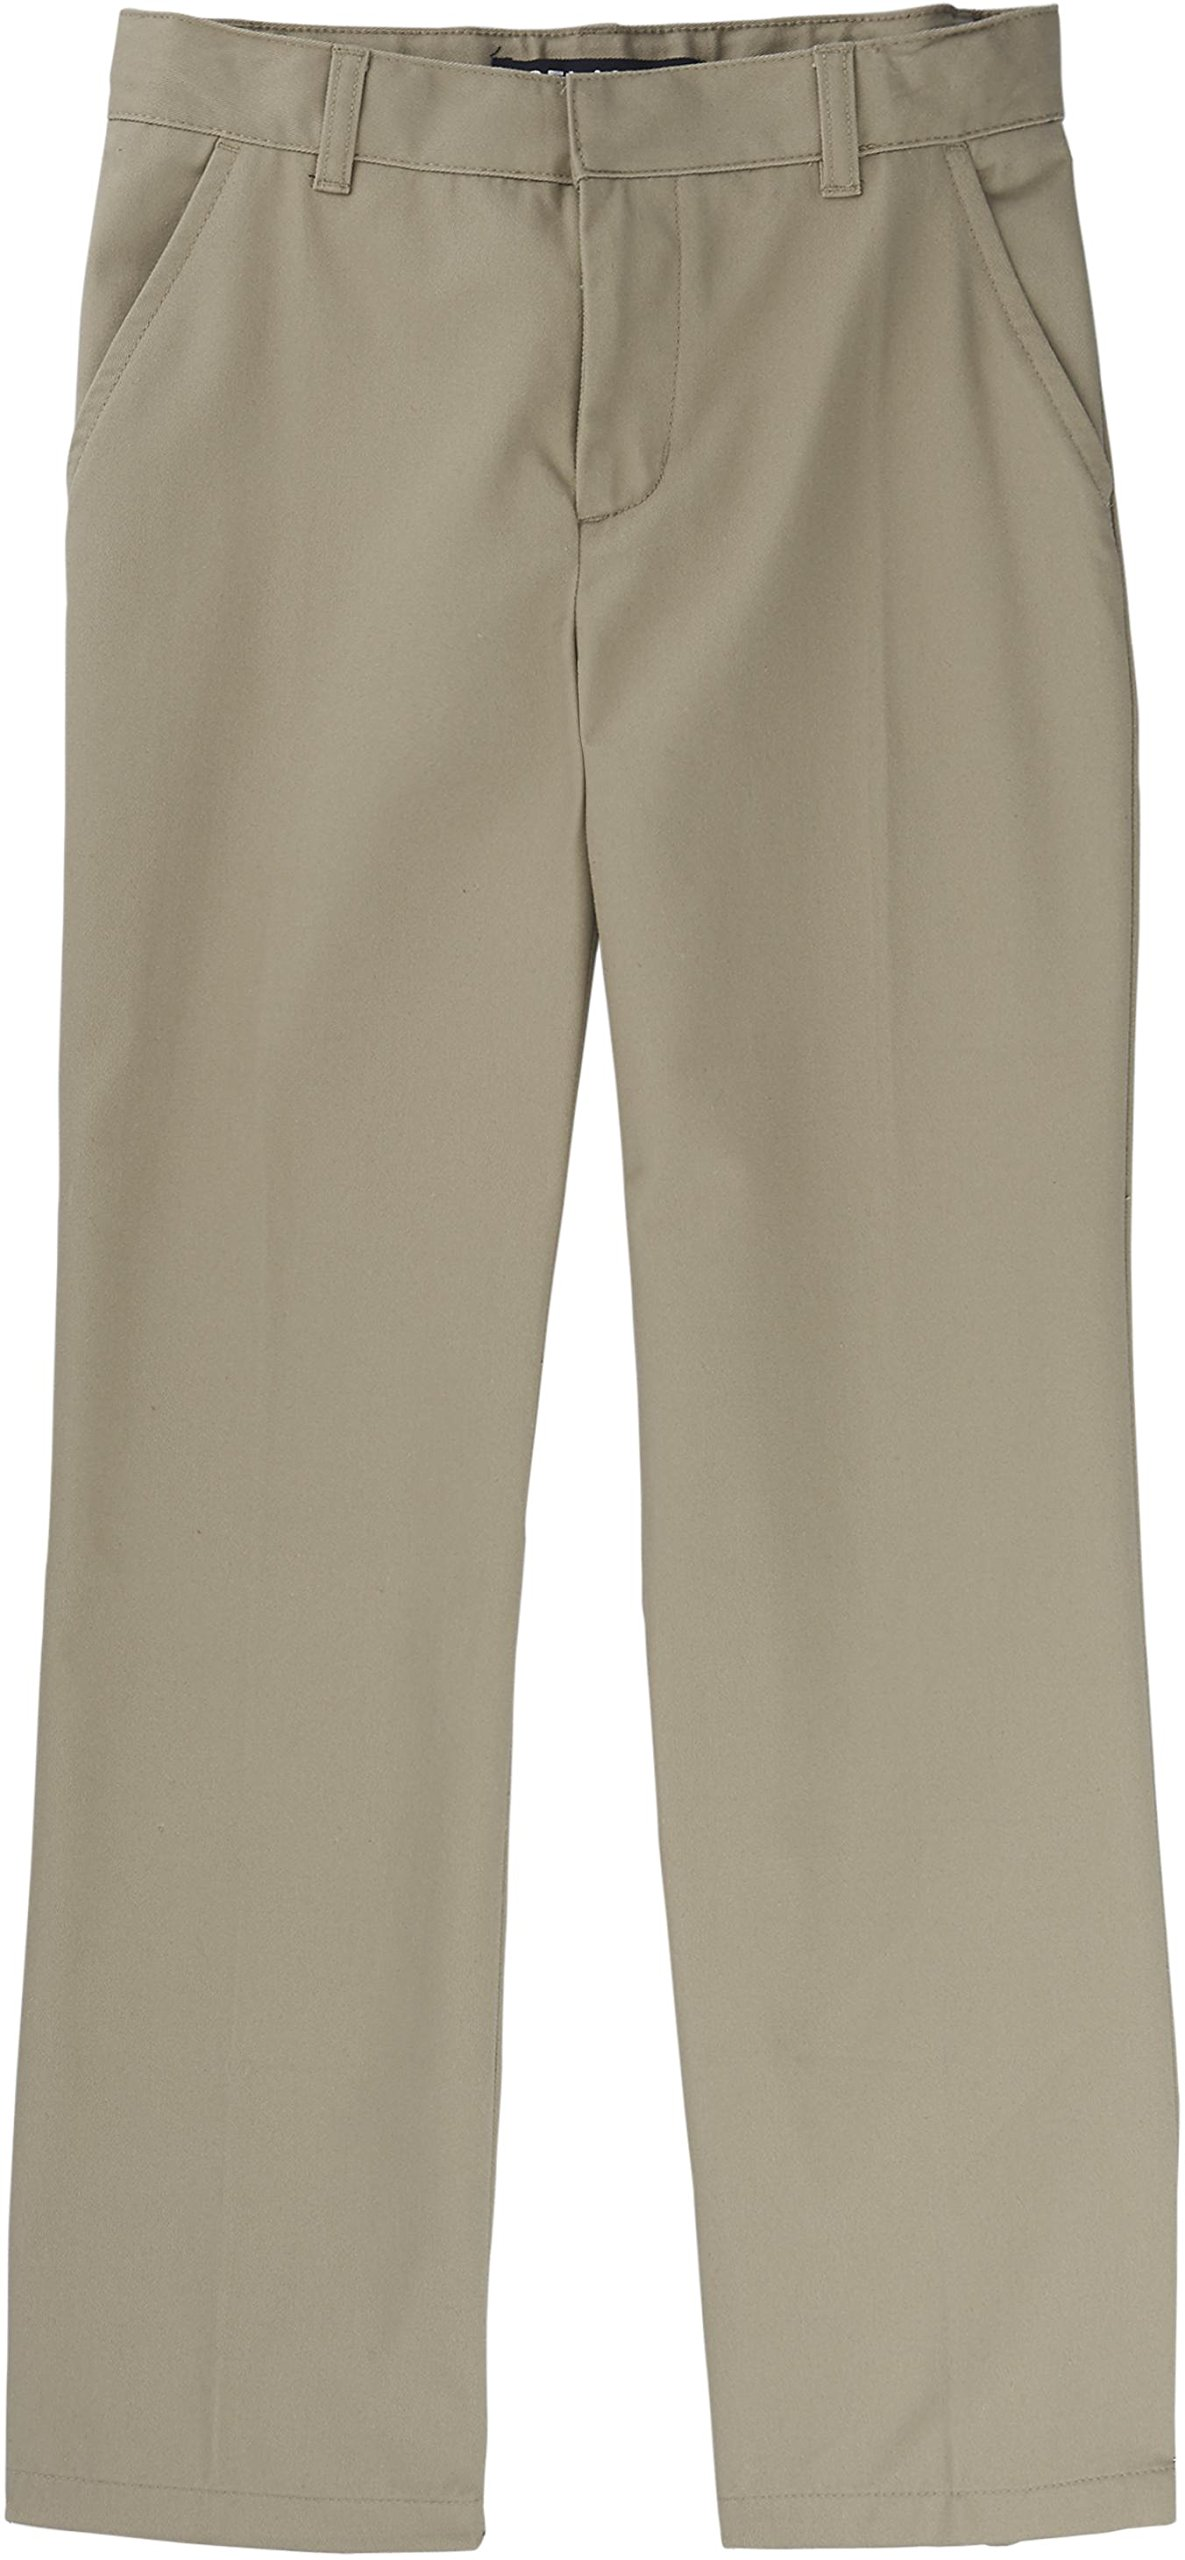 French Toast School Uniform Boys Adjustable Waist Flat Front Double Knee Pants, Khaki, 16 Husky